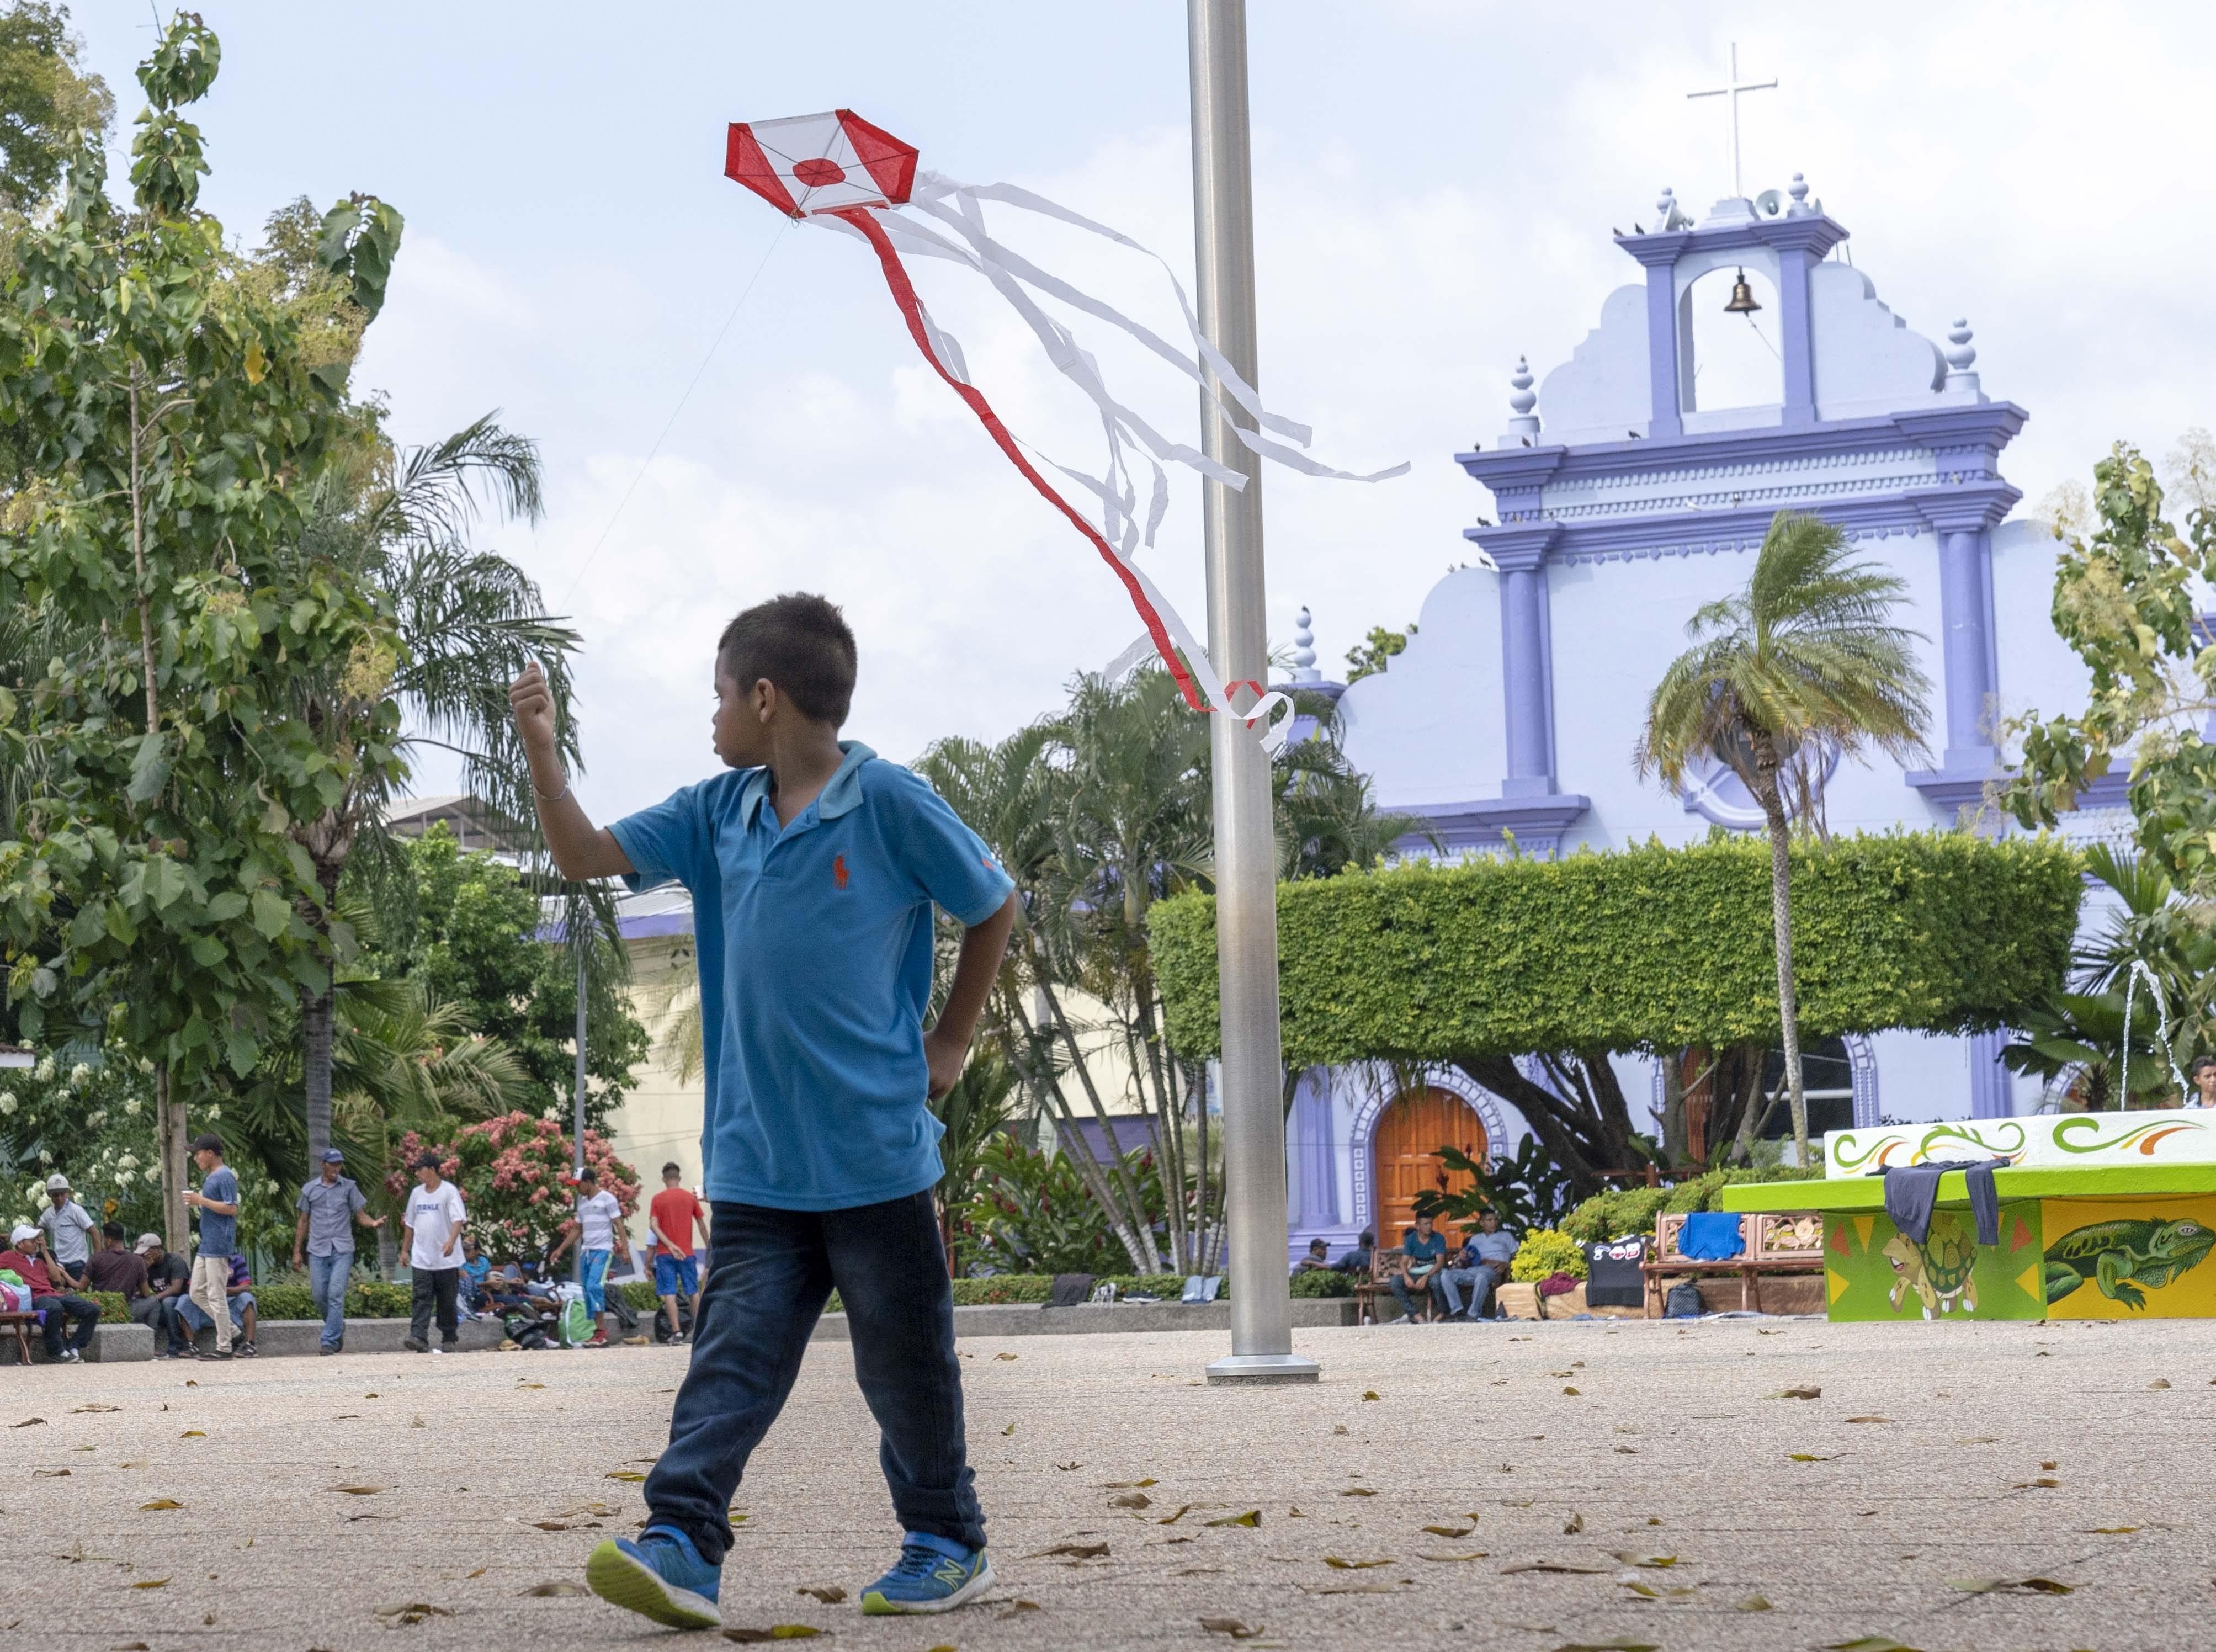 Migrant children from Honduras and El Salvador play in the park in Tecun Uman, Guatemala.